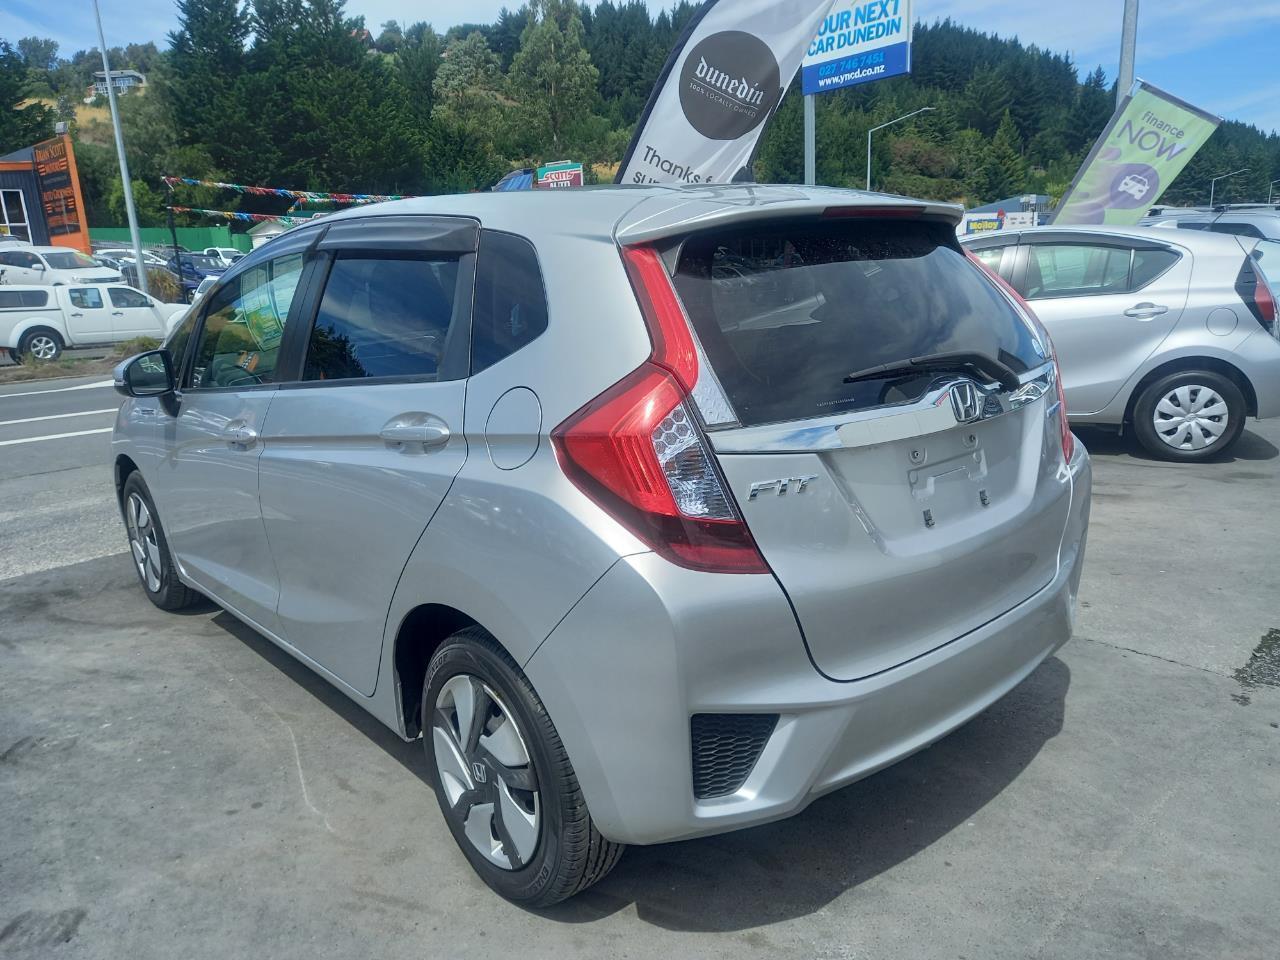 image-6, 2015 Honda Fit Hybrid No Deposit Finance at Dunedin